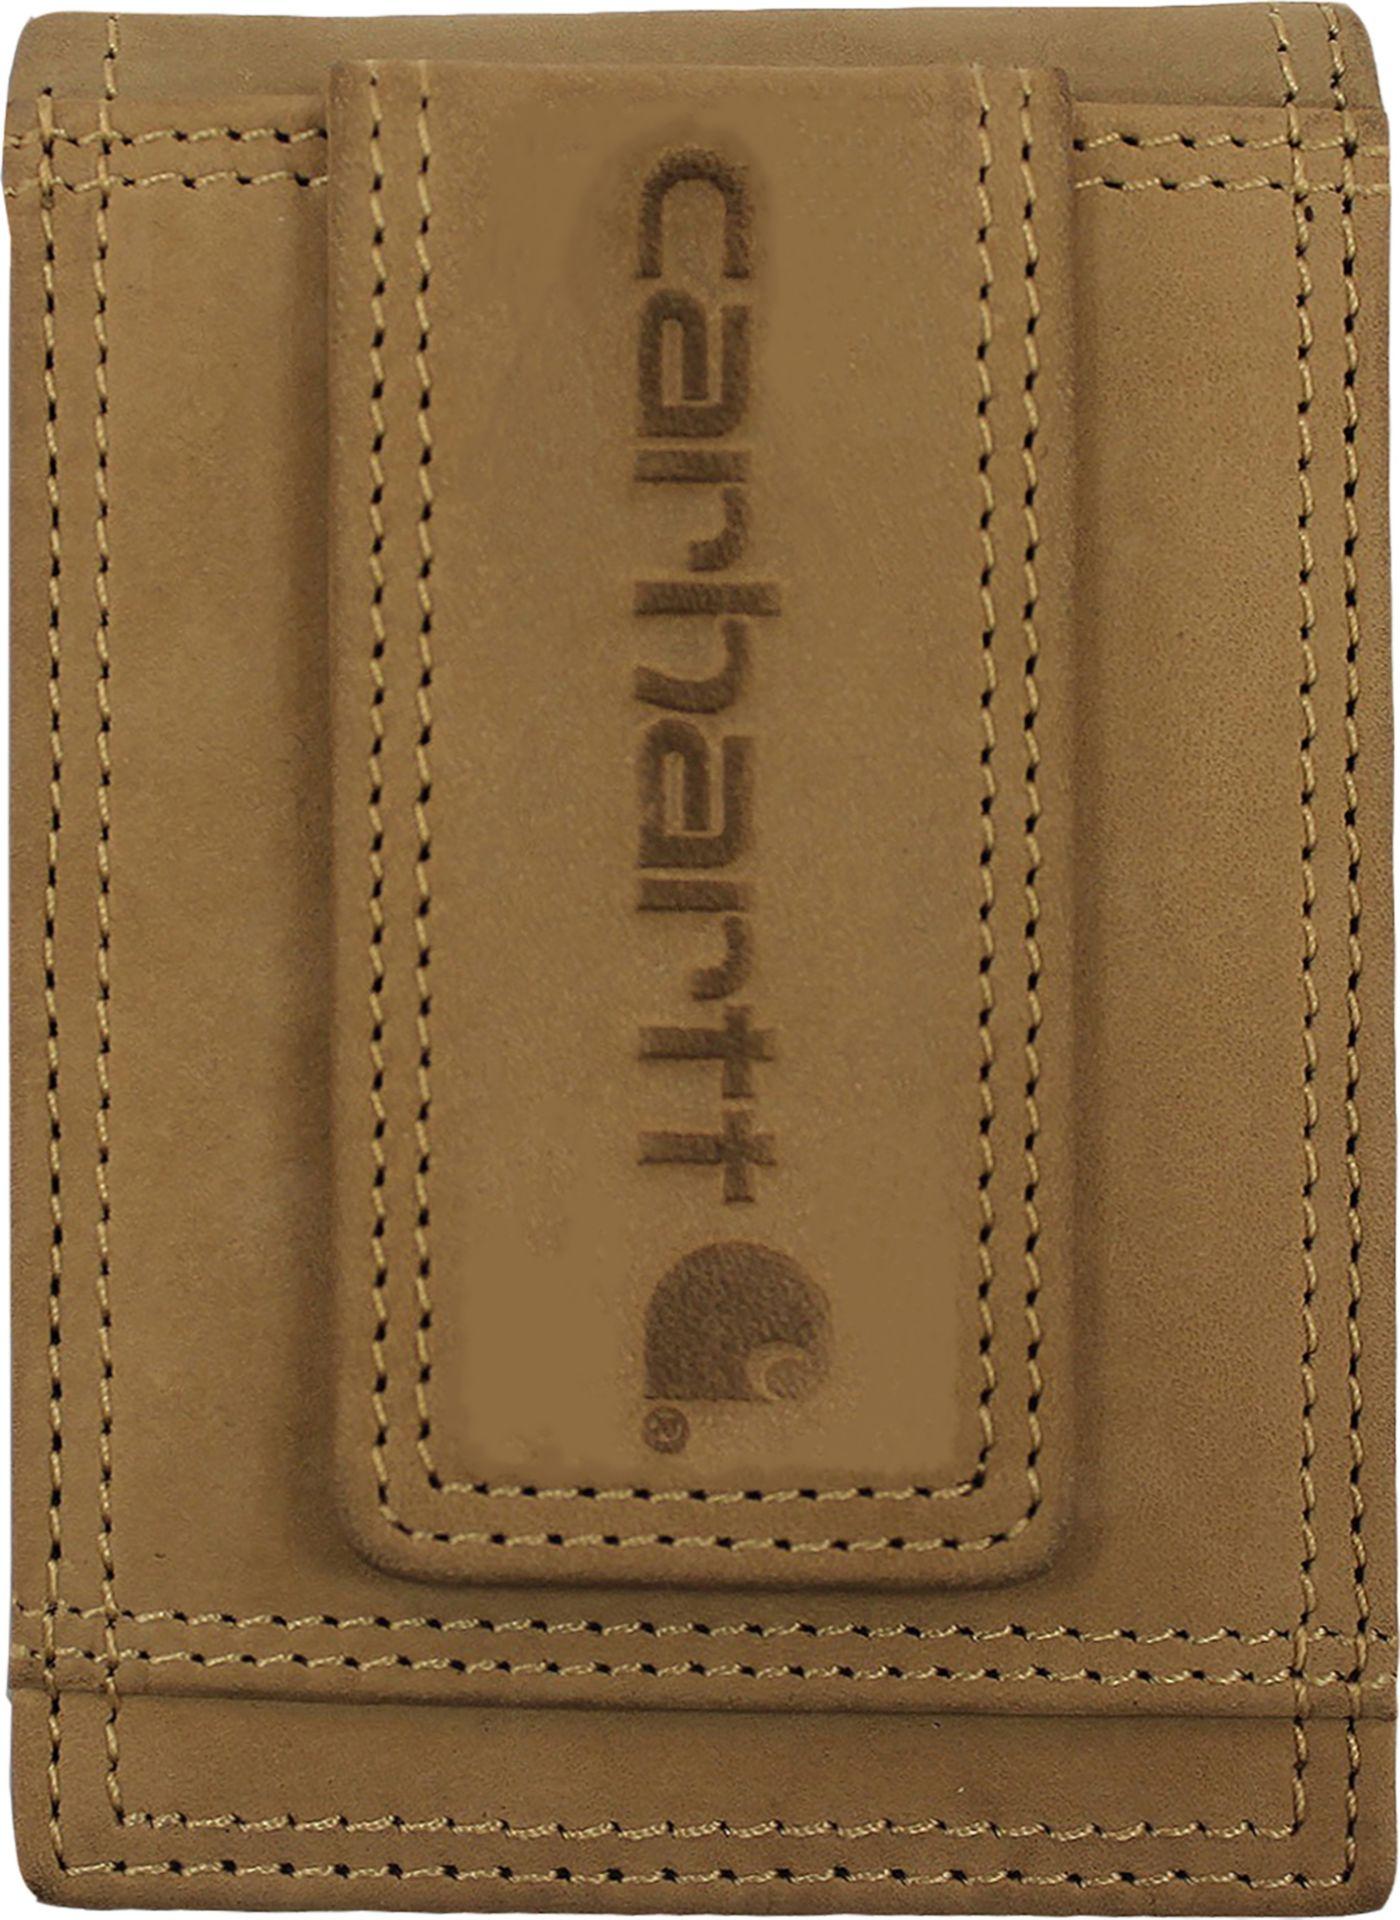 Carhartt Men's Two-Tone Front Pocket Wallet